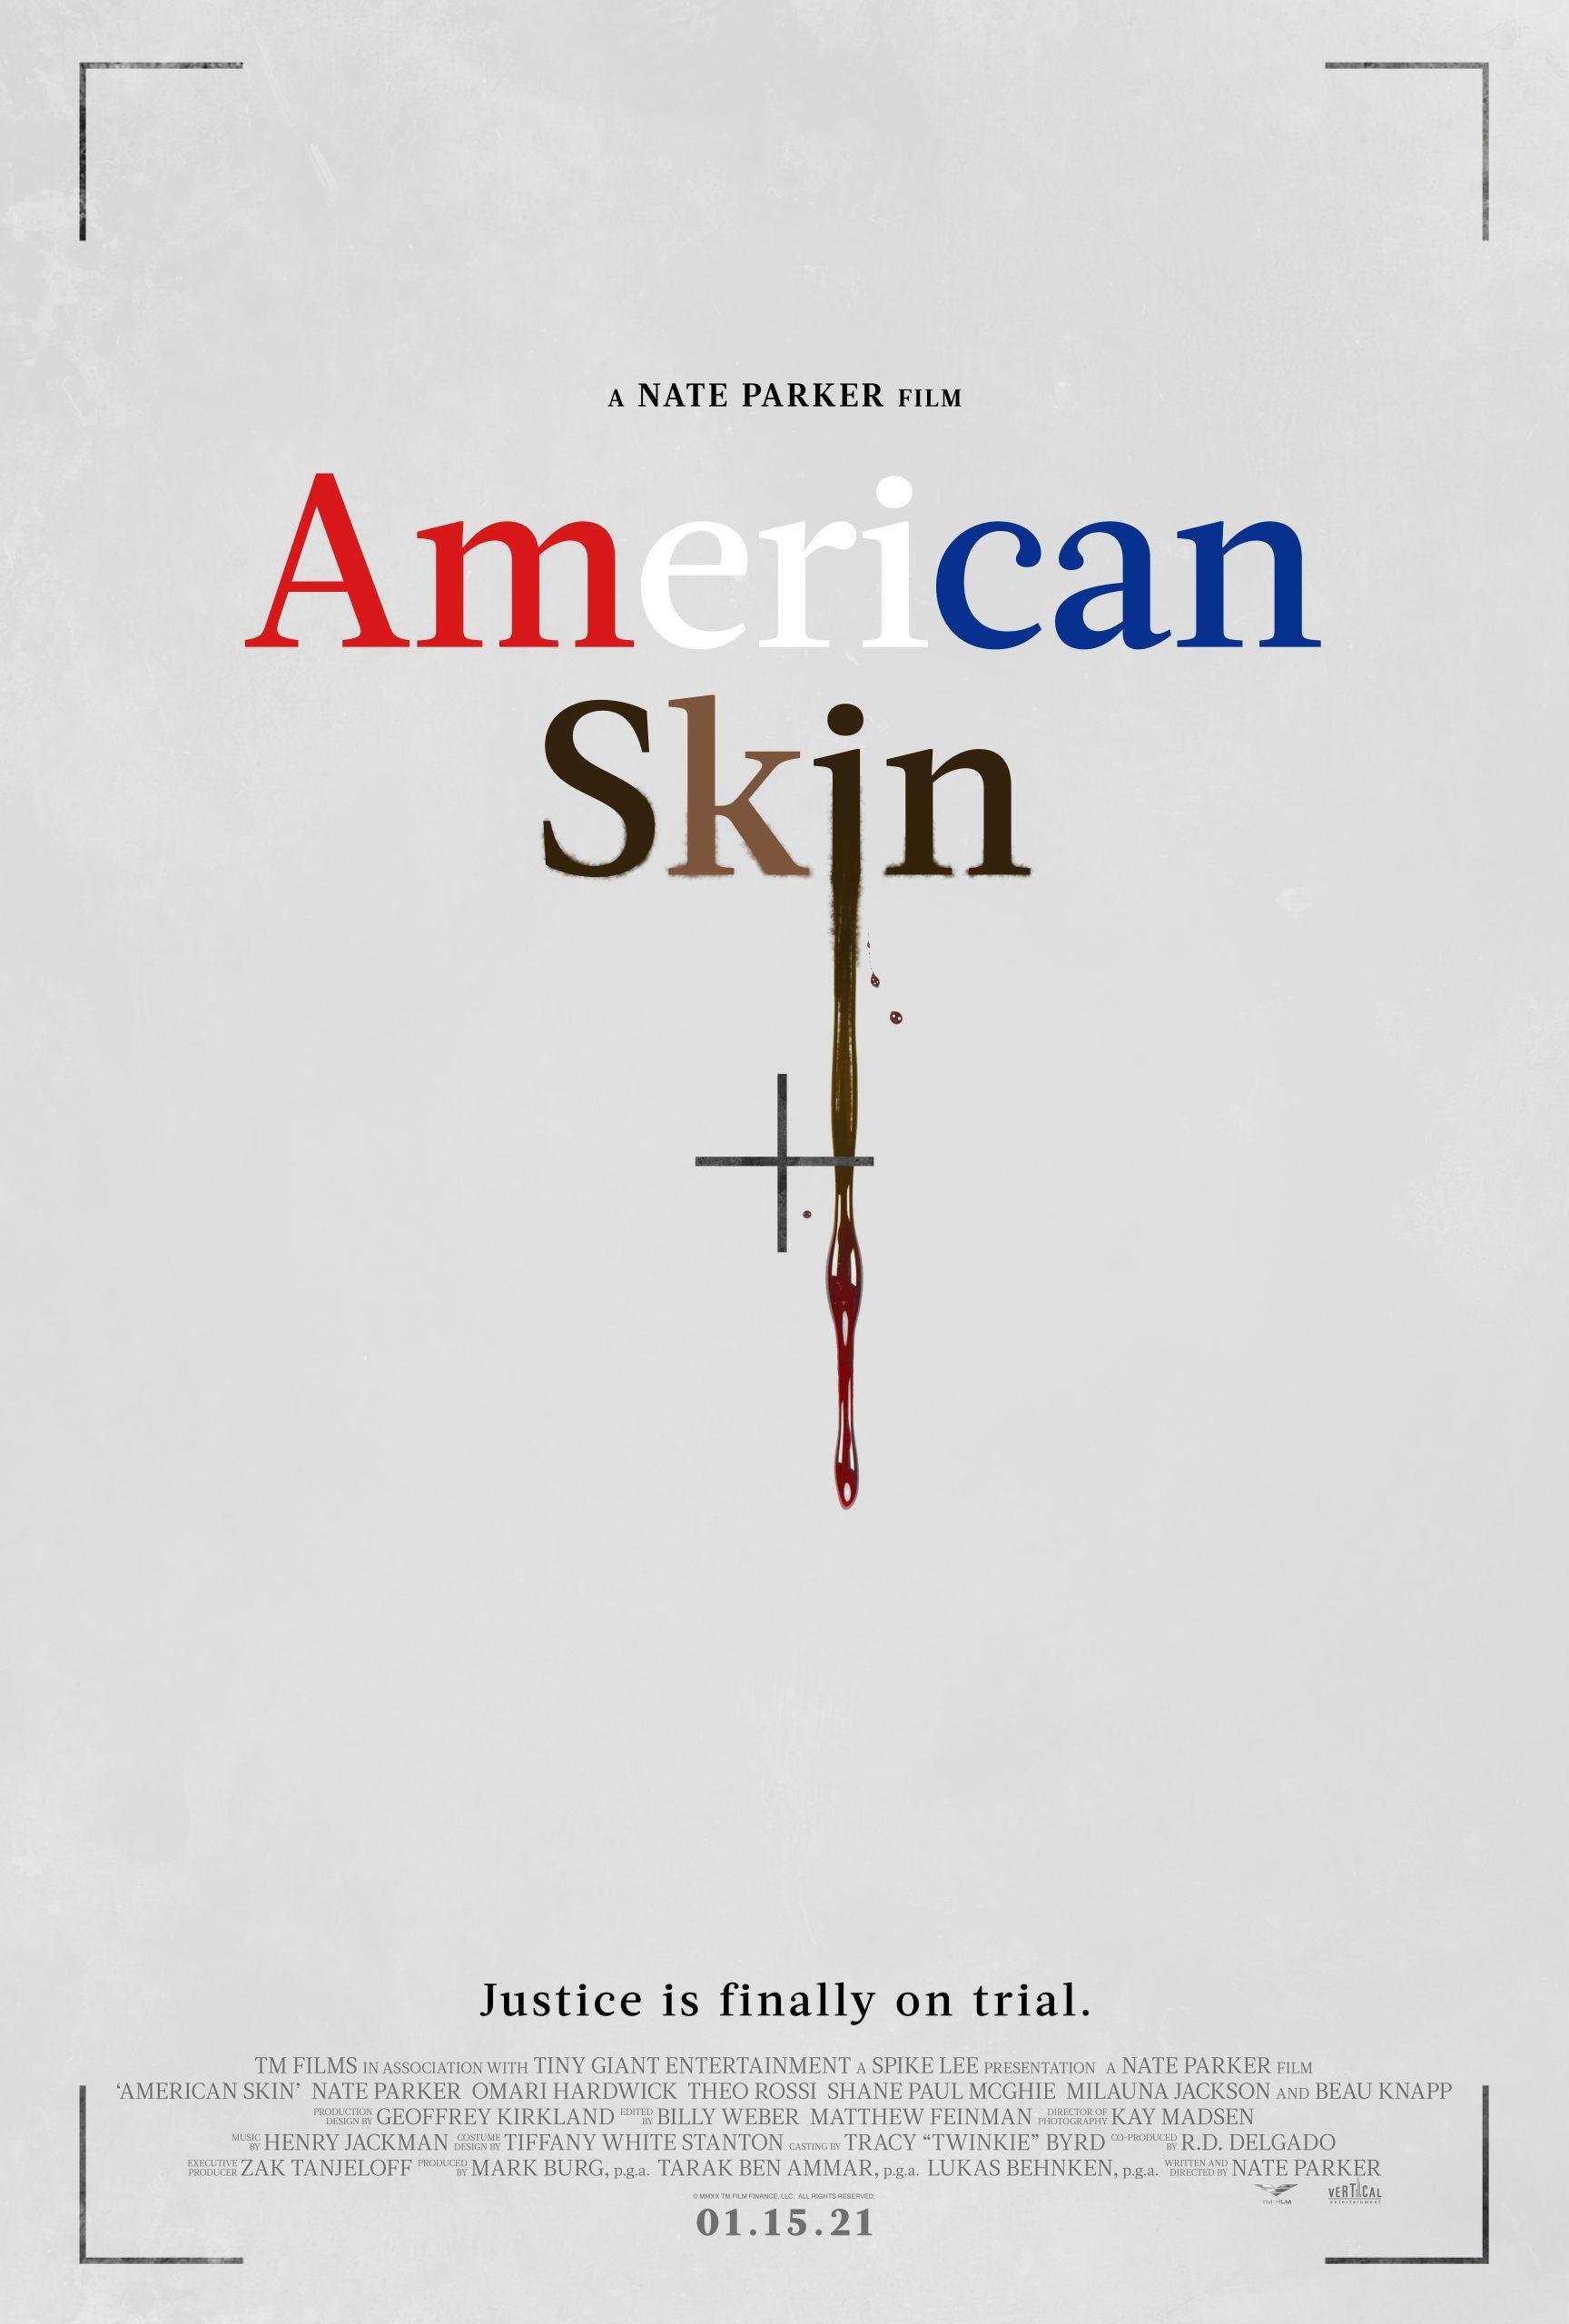 New Movie: Spike Lee's American Skin